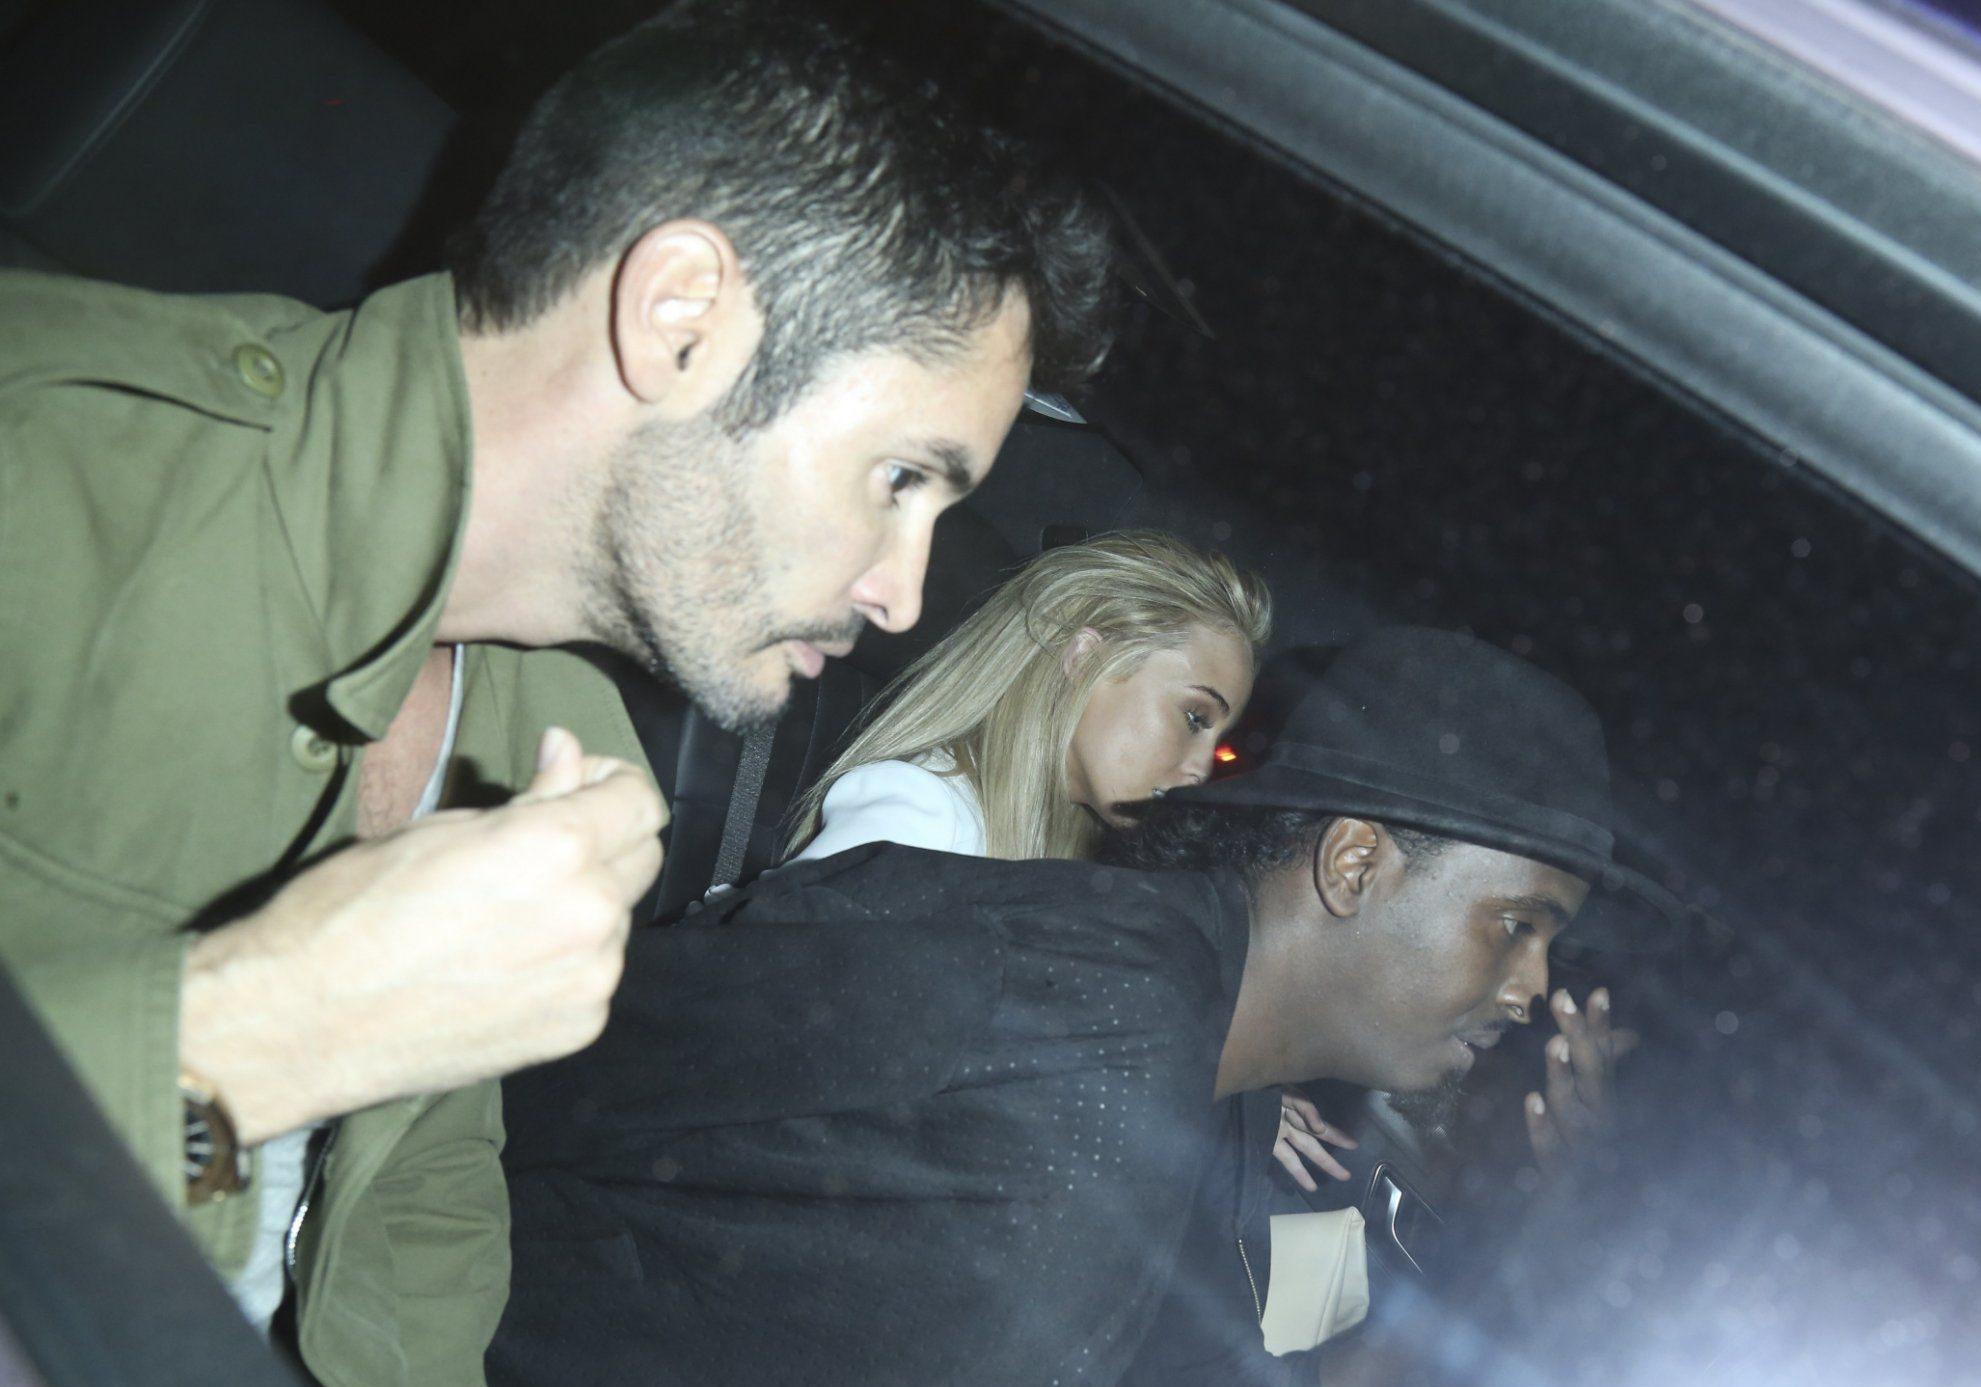 Jean-Bernard Fernandez Versini left a club with Alex Mytton's Made In Chelsea girlfriend Nicola Hughes